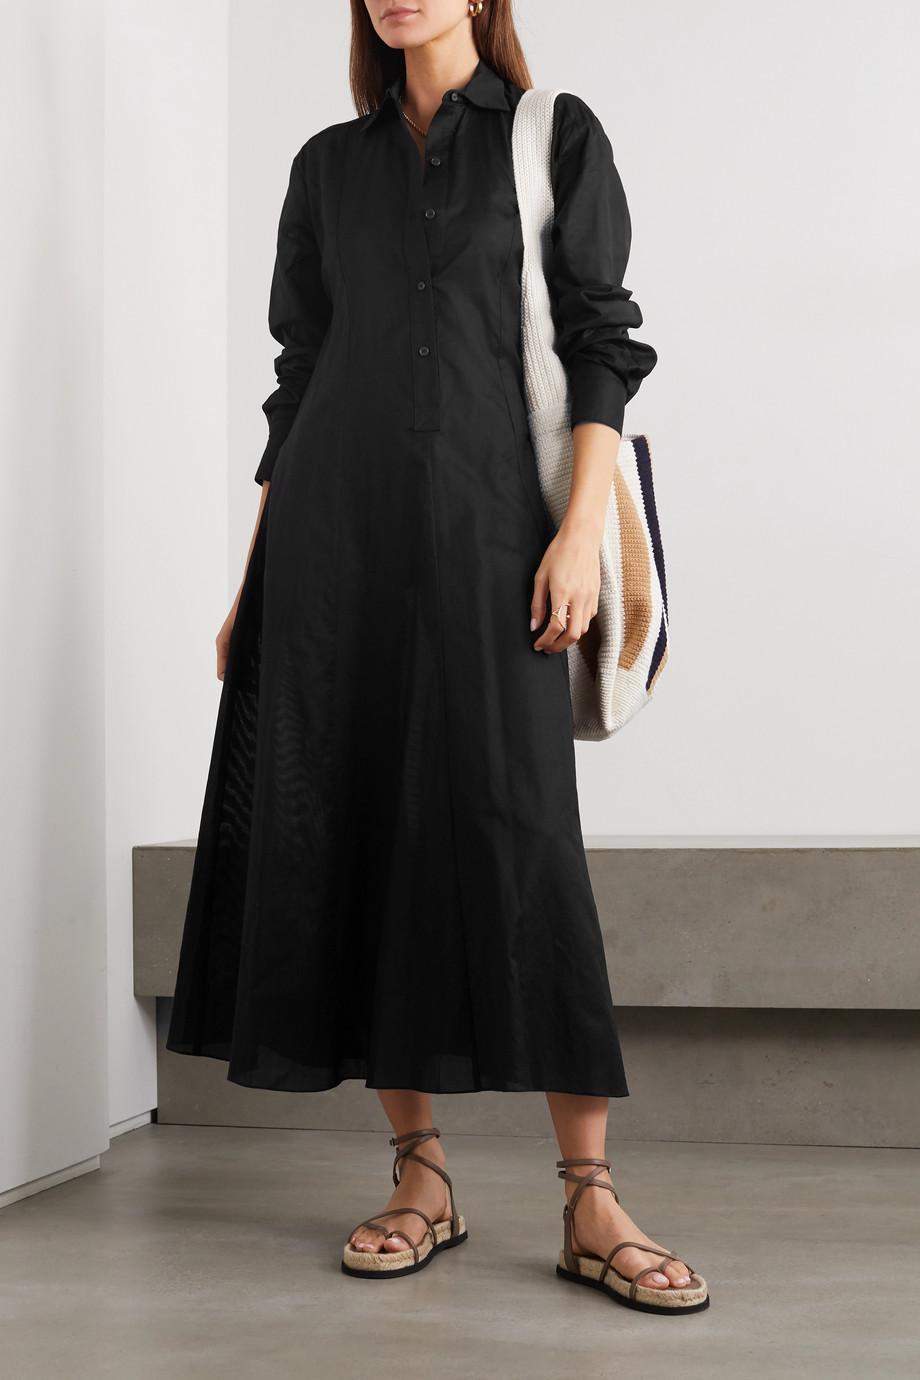 Three Graces London Fallon cotton-gauze shirt dress